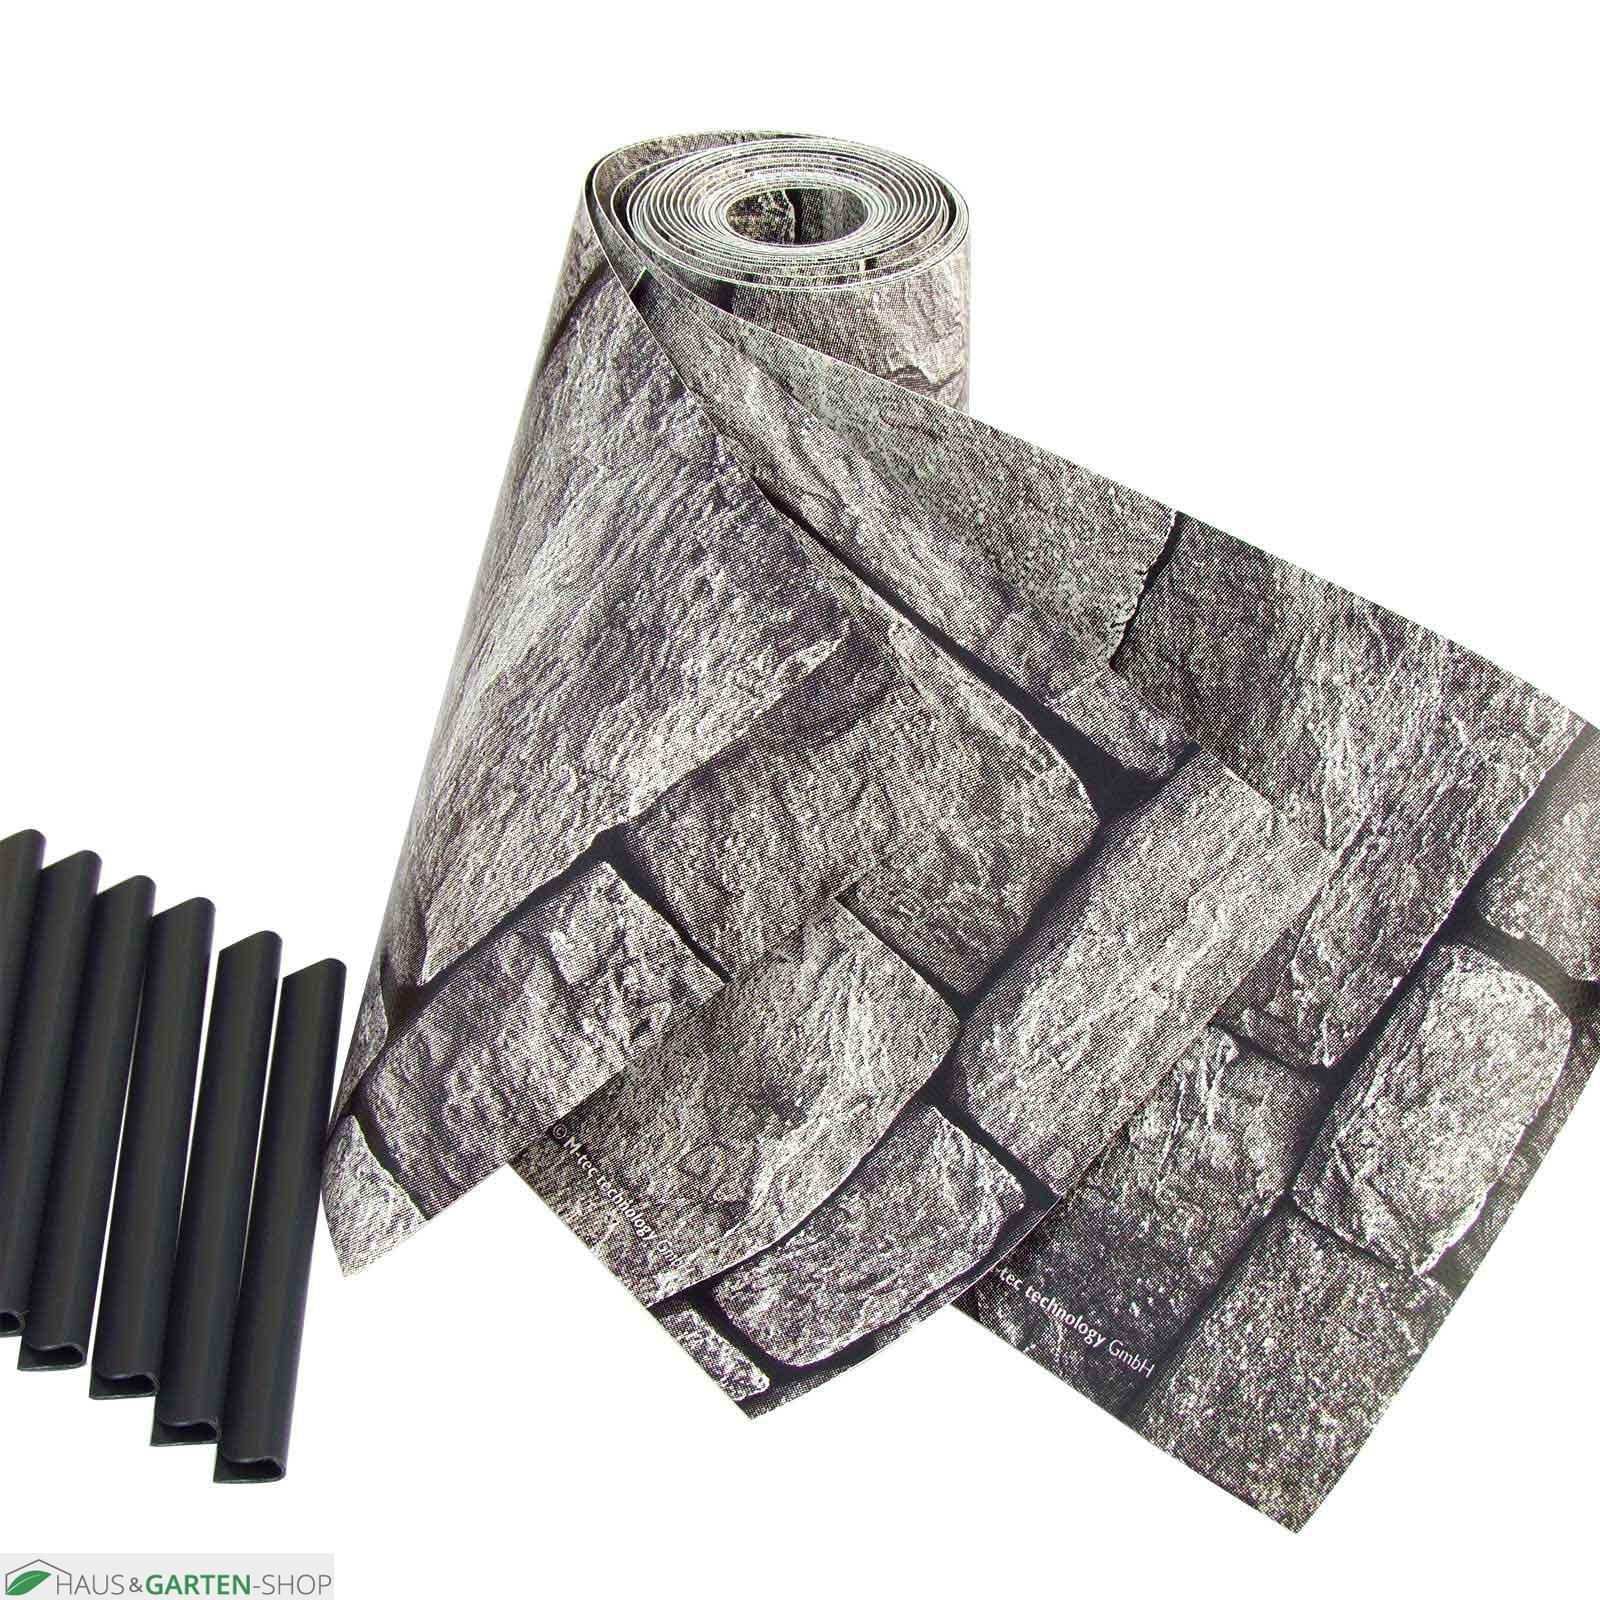 pvc m tec print flecht sichtschutzsteifen granitmauer motiv. Black Bedroom Furniture Sets. Home Design Ideas